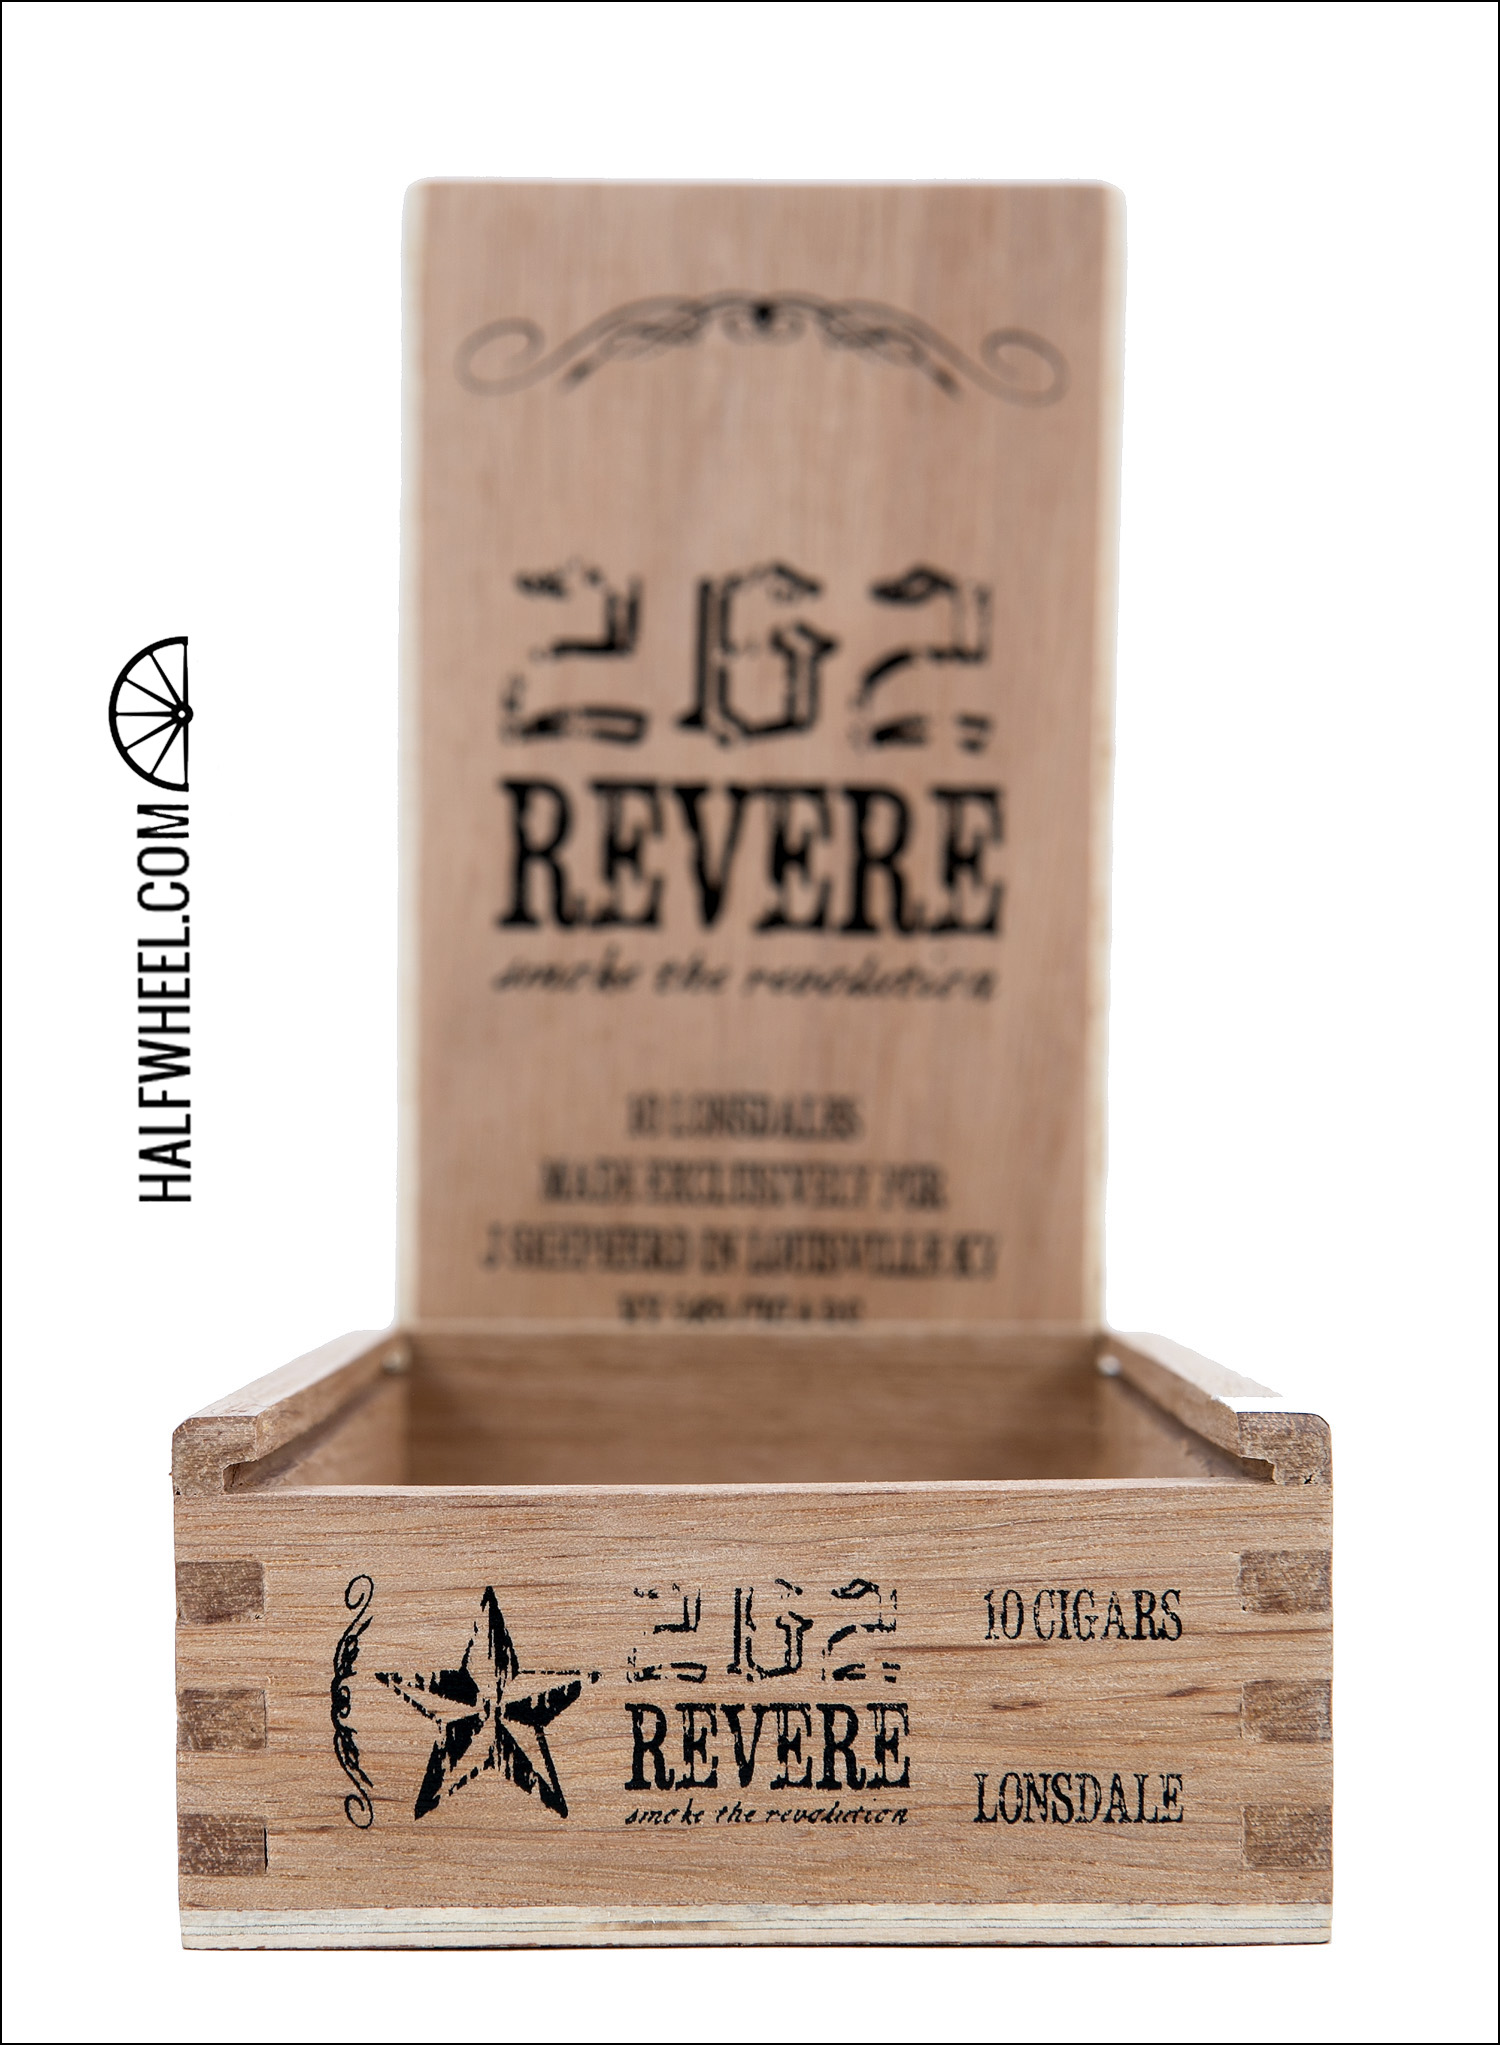 262 Revere Lonsdale Box 2